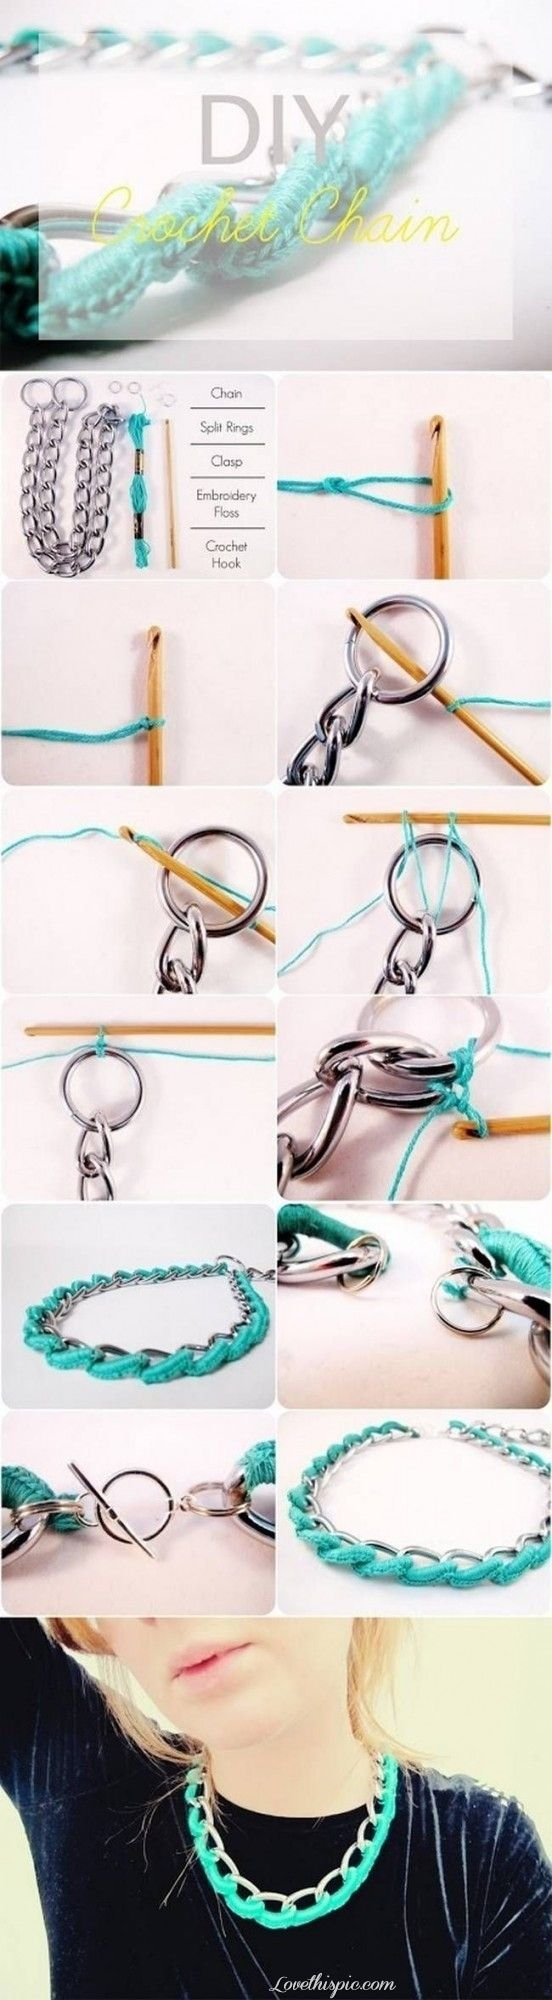 diy crochet chain diy craft crafts easy crafts easy diy diy jewelry diy bracelet